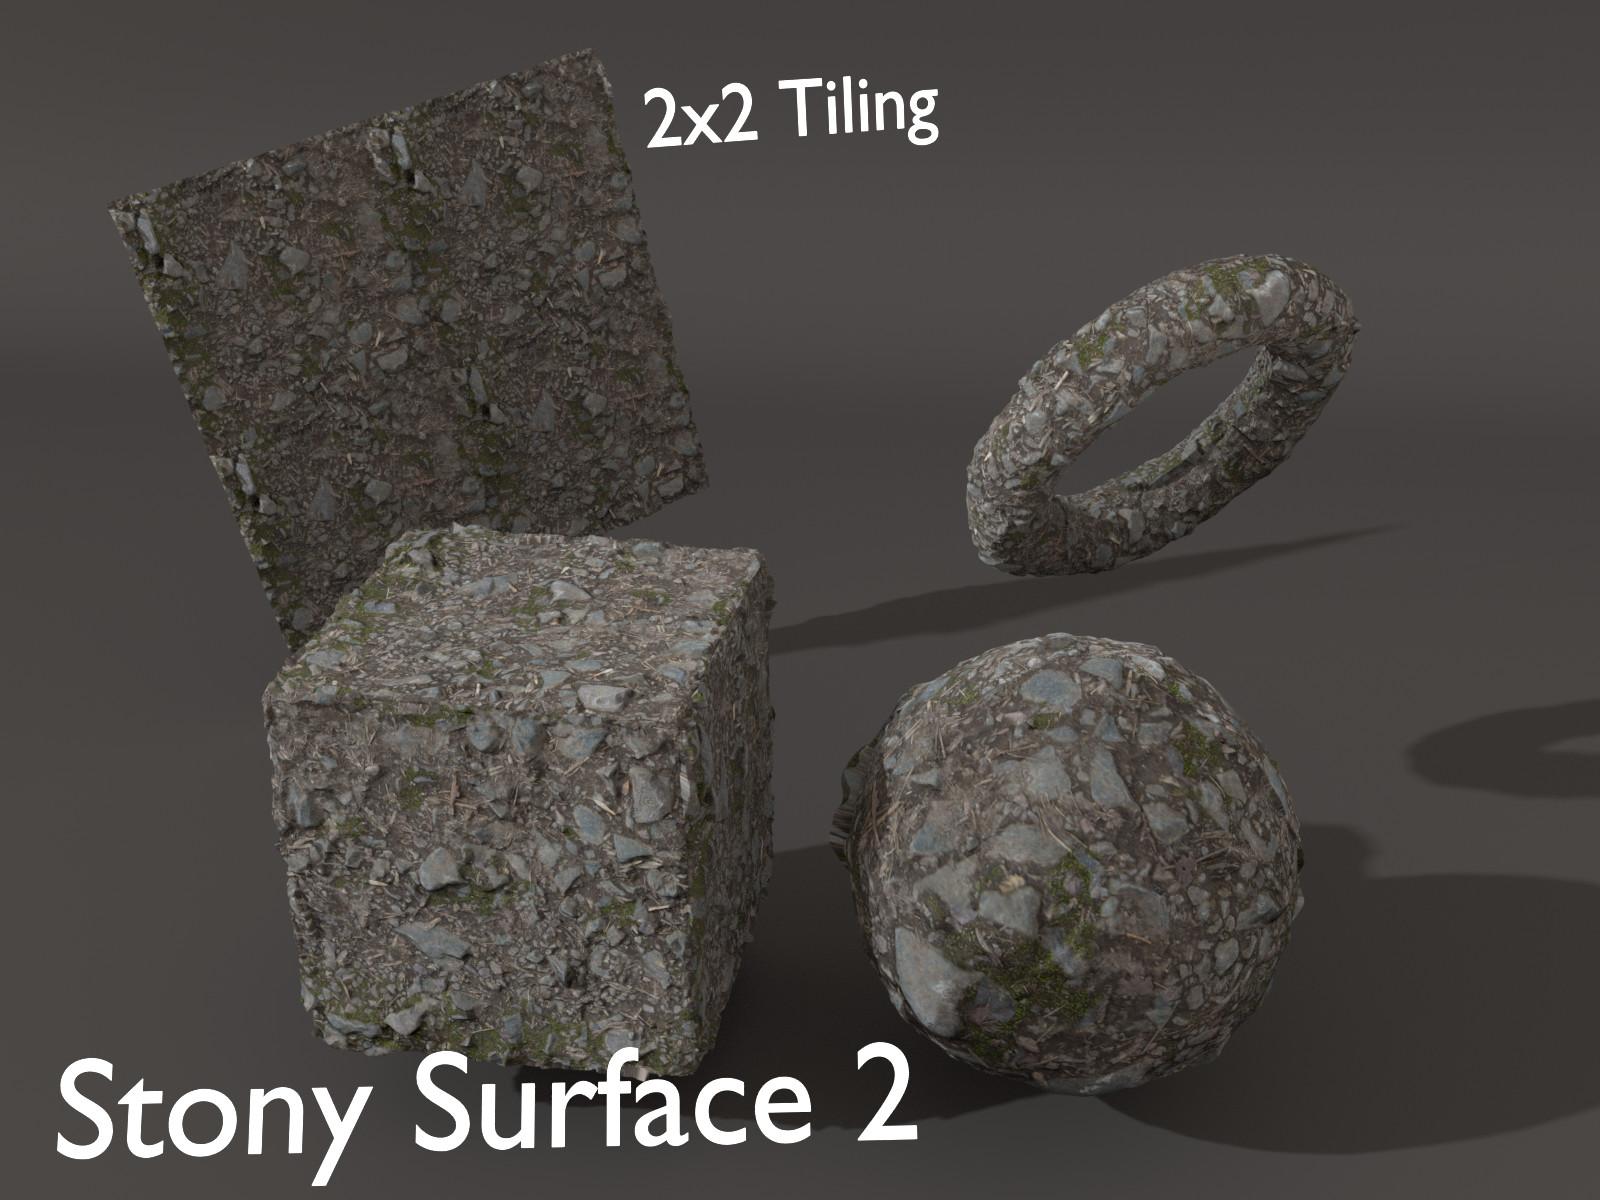 Sieben corgie stonysurface 2 p